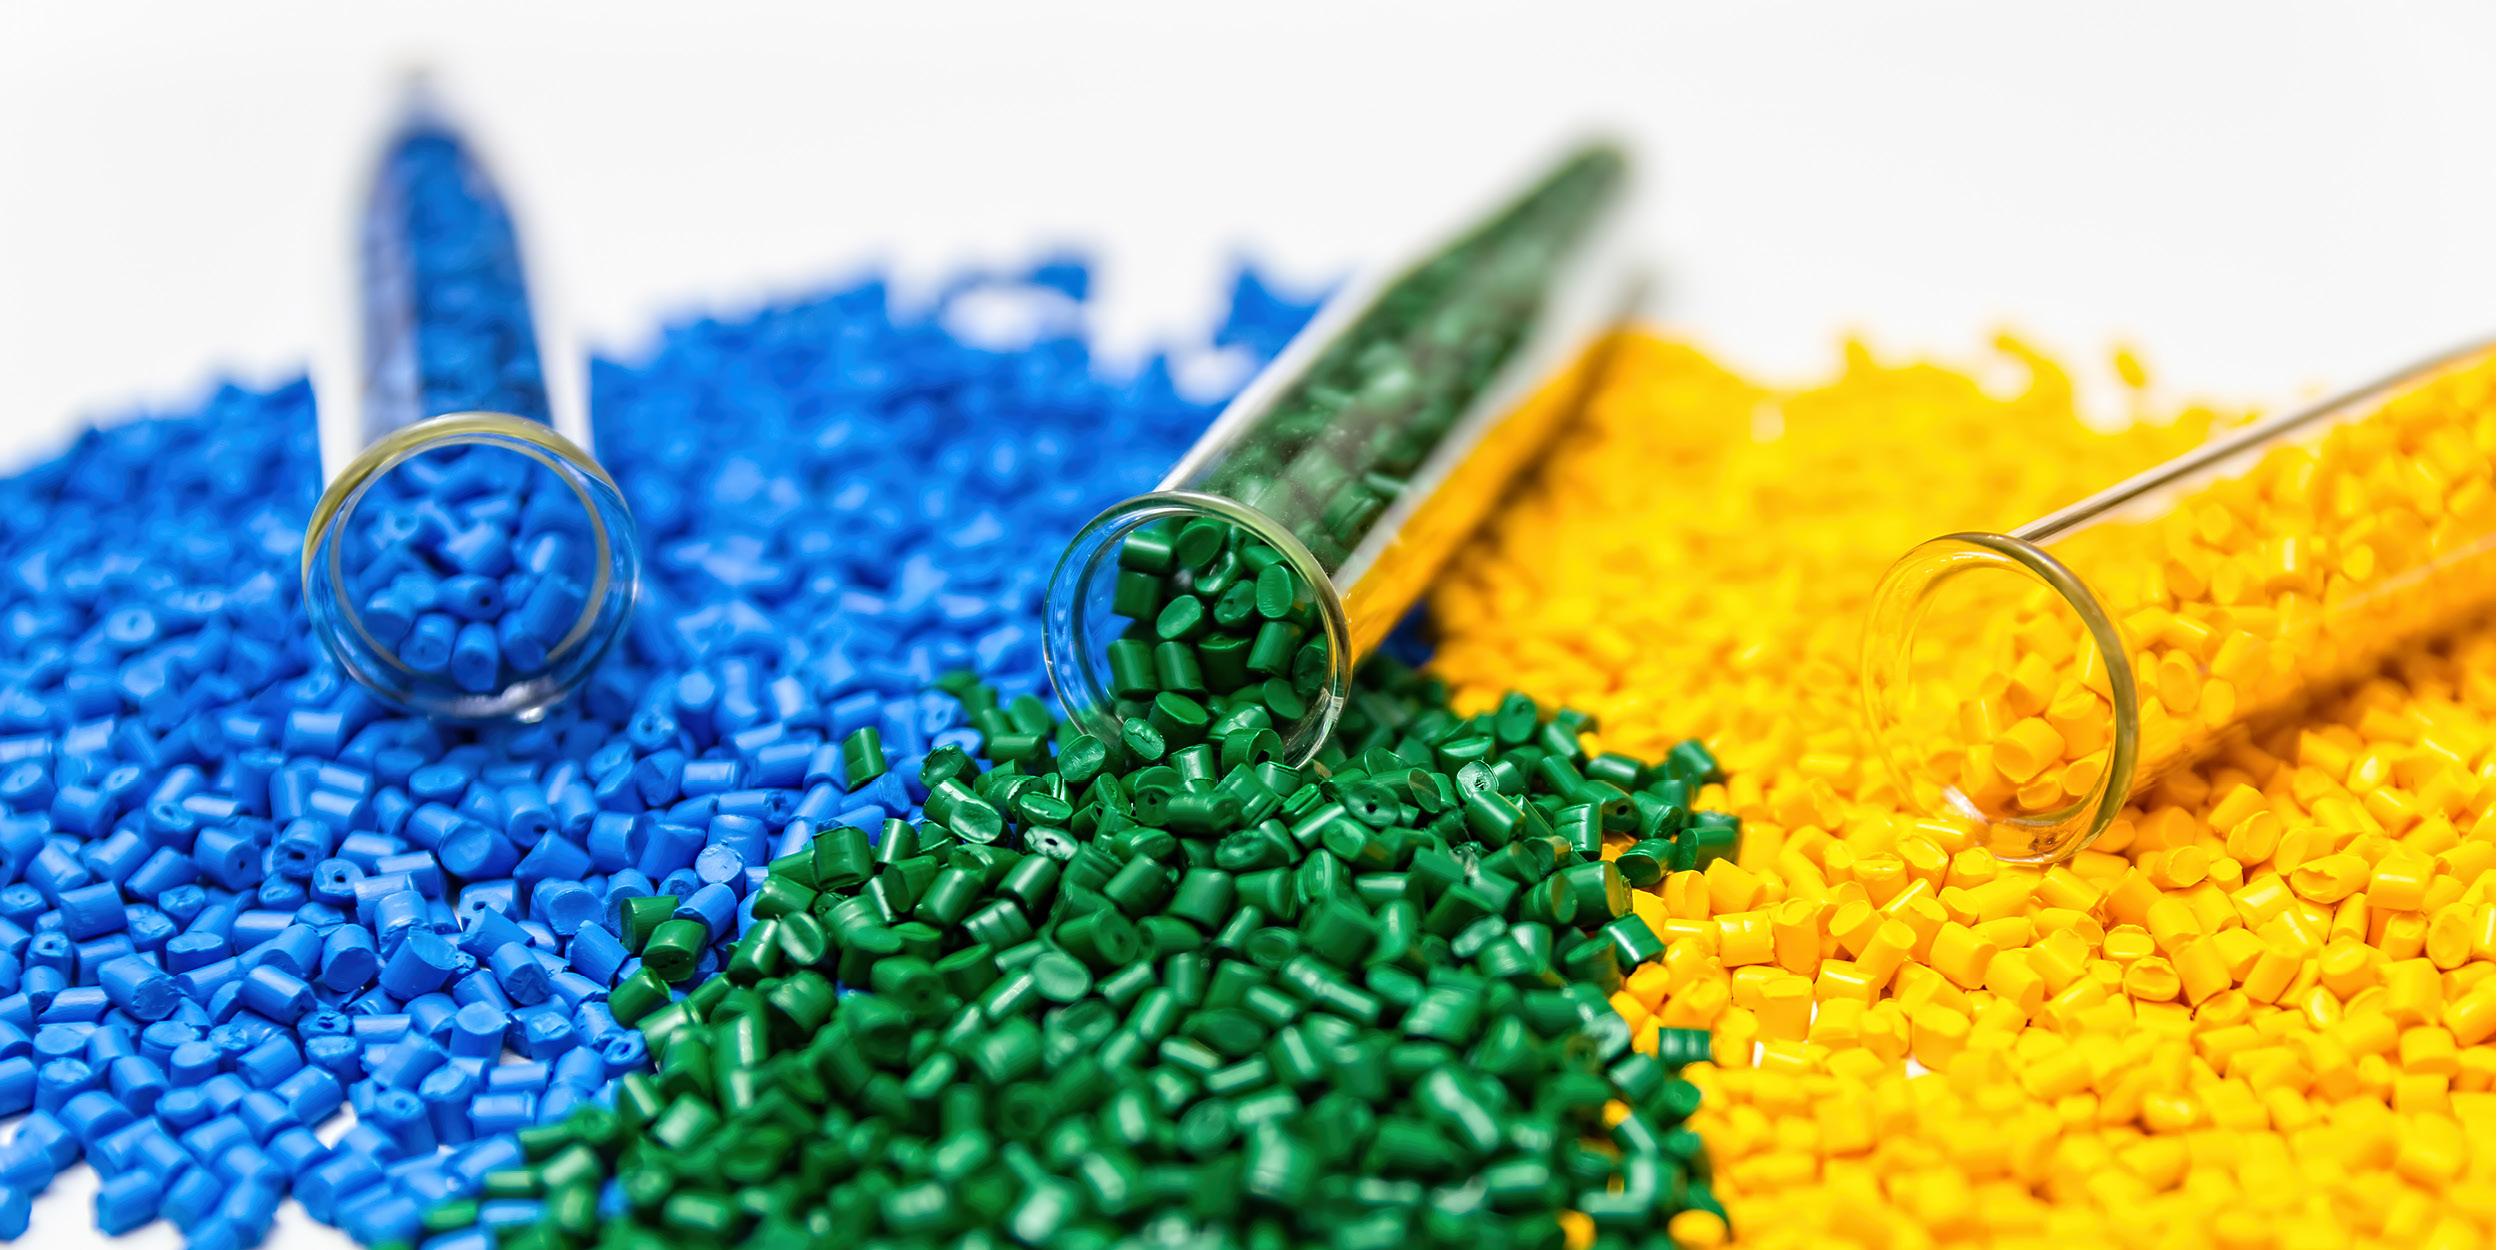 Next-generations materials - bioplastcs